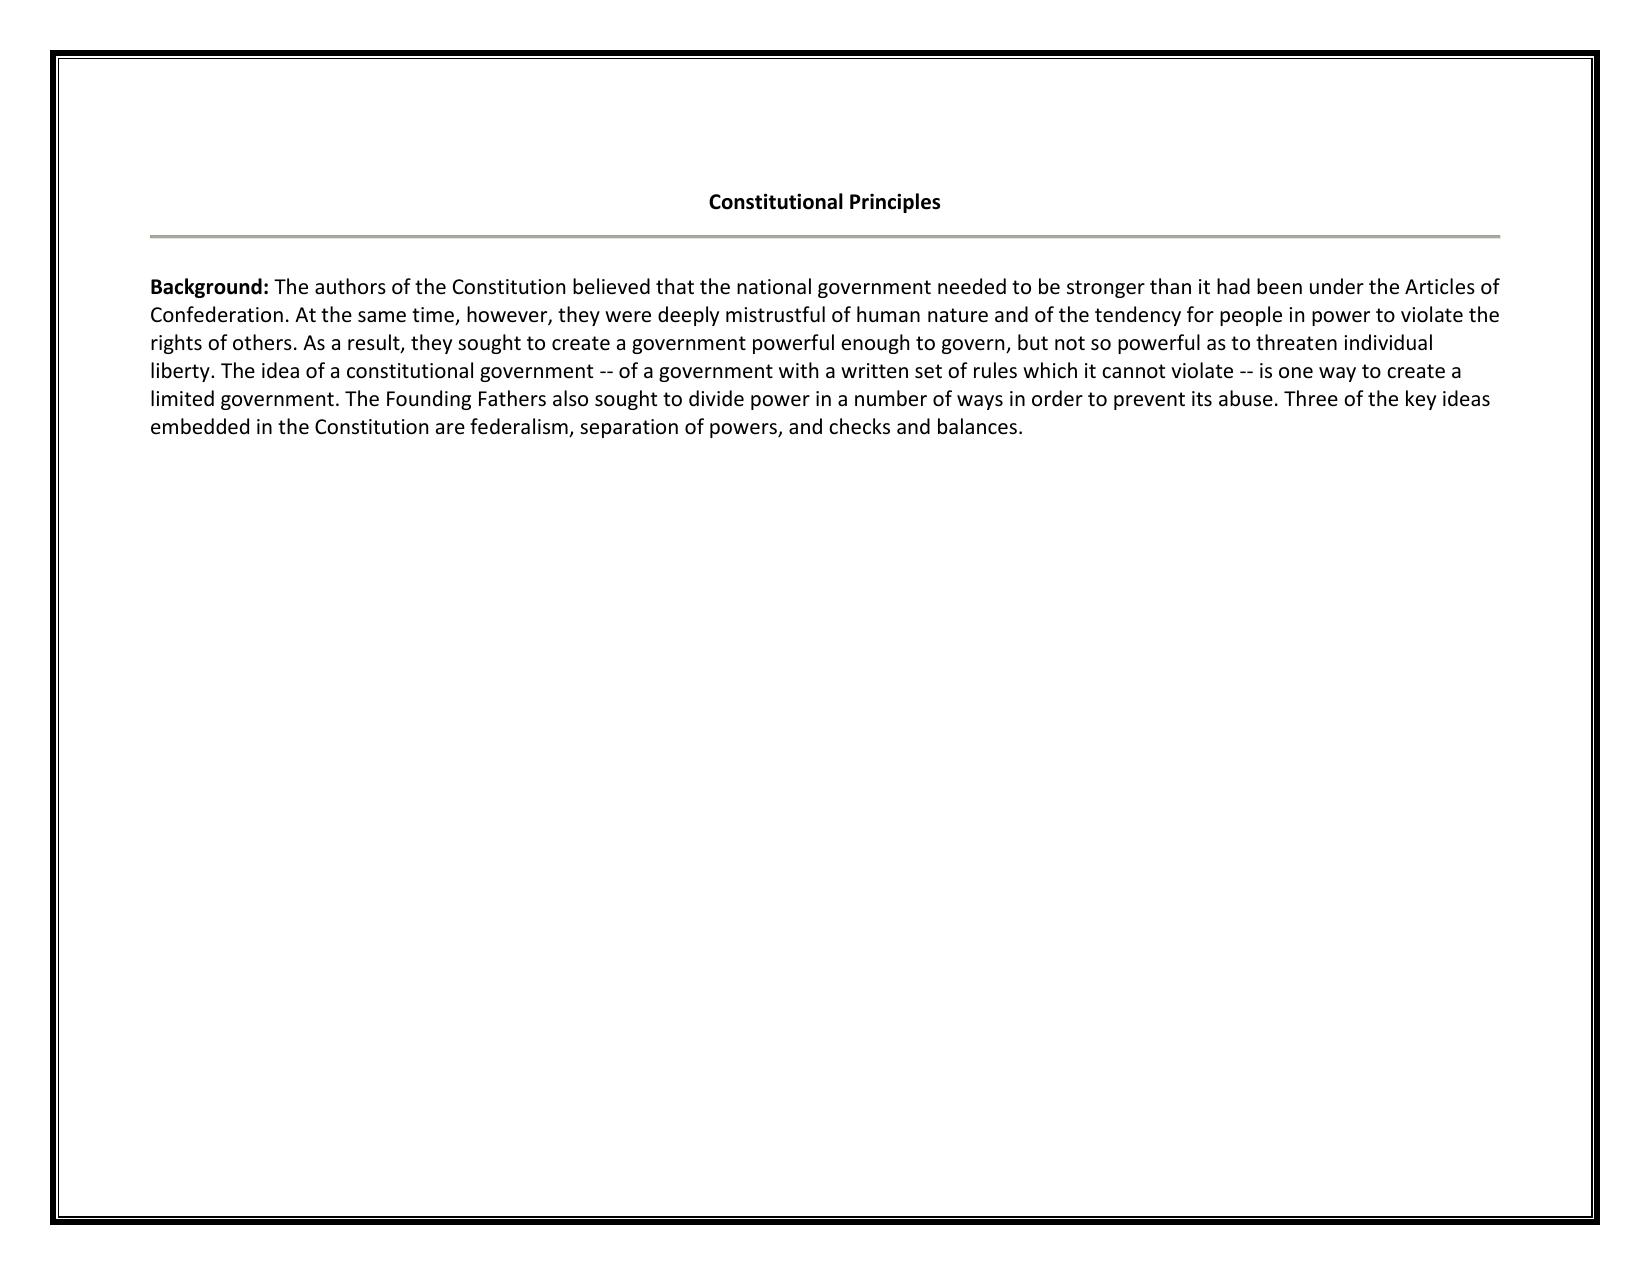 Constitutional Principles Worksheet